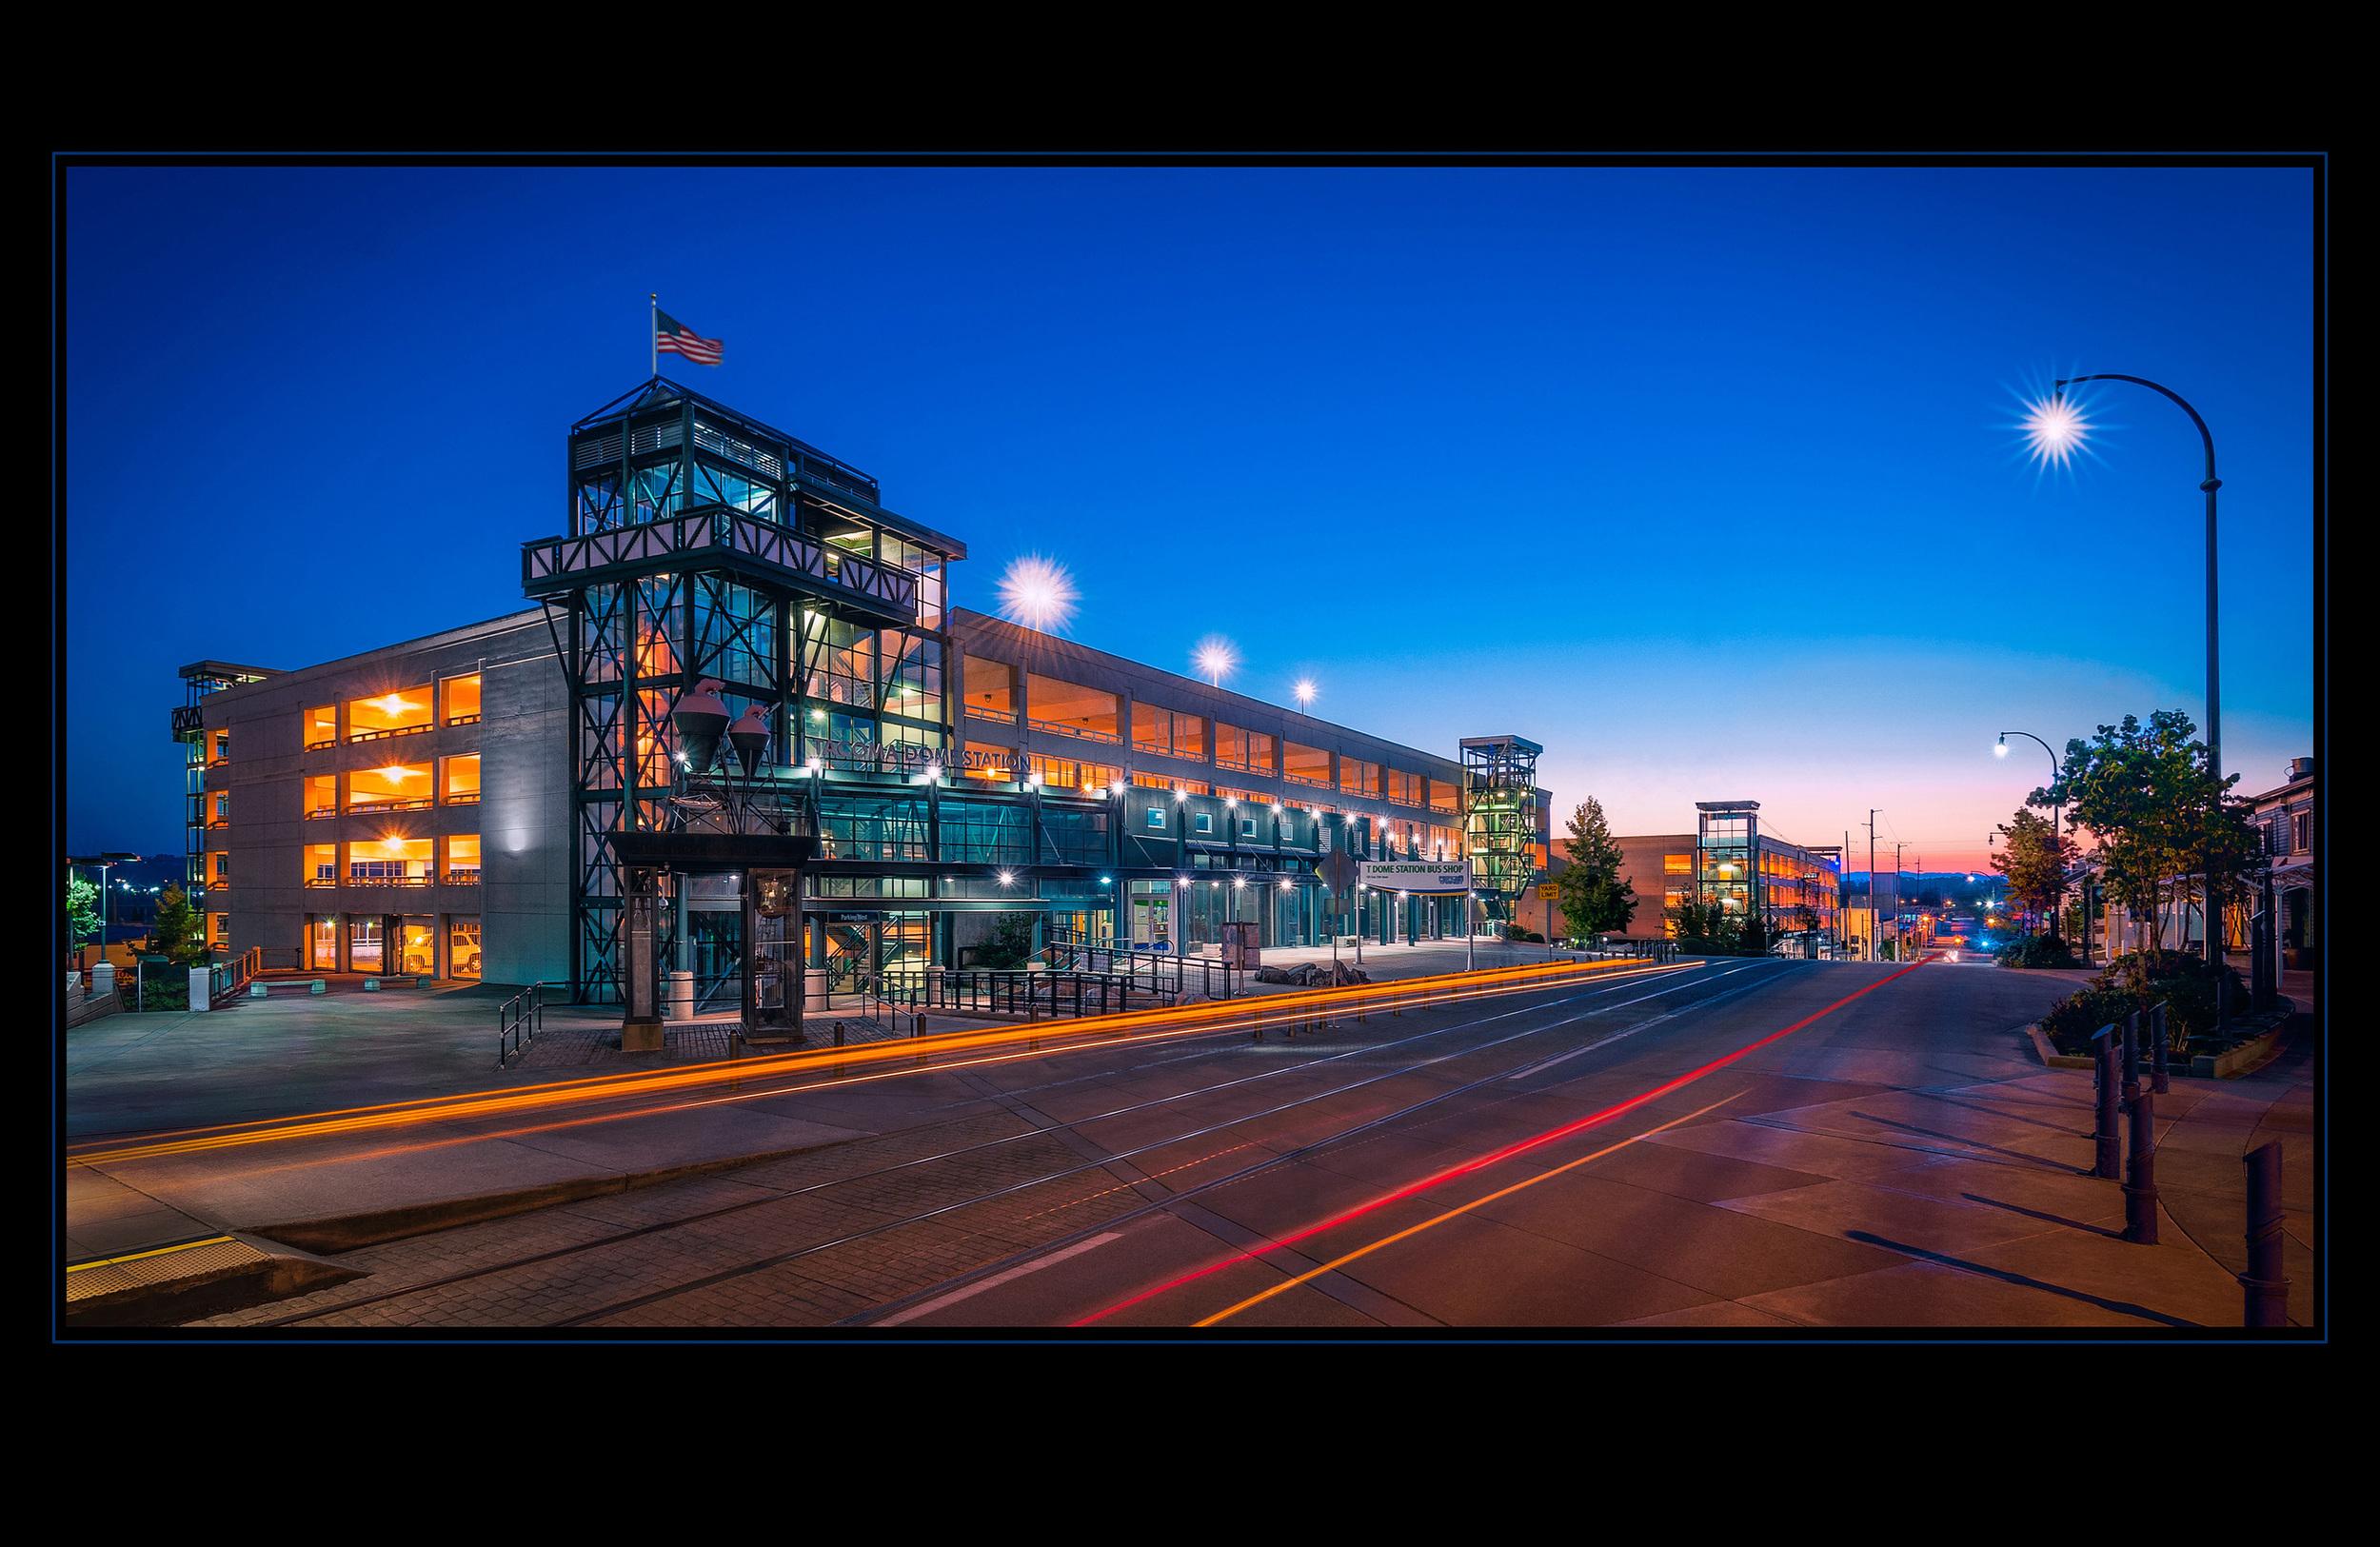 Tacoma Dome Station